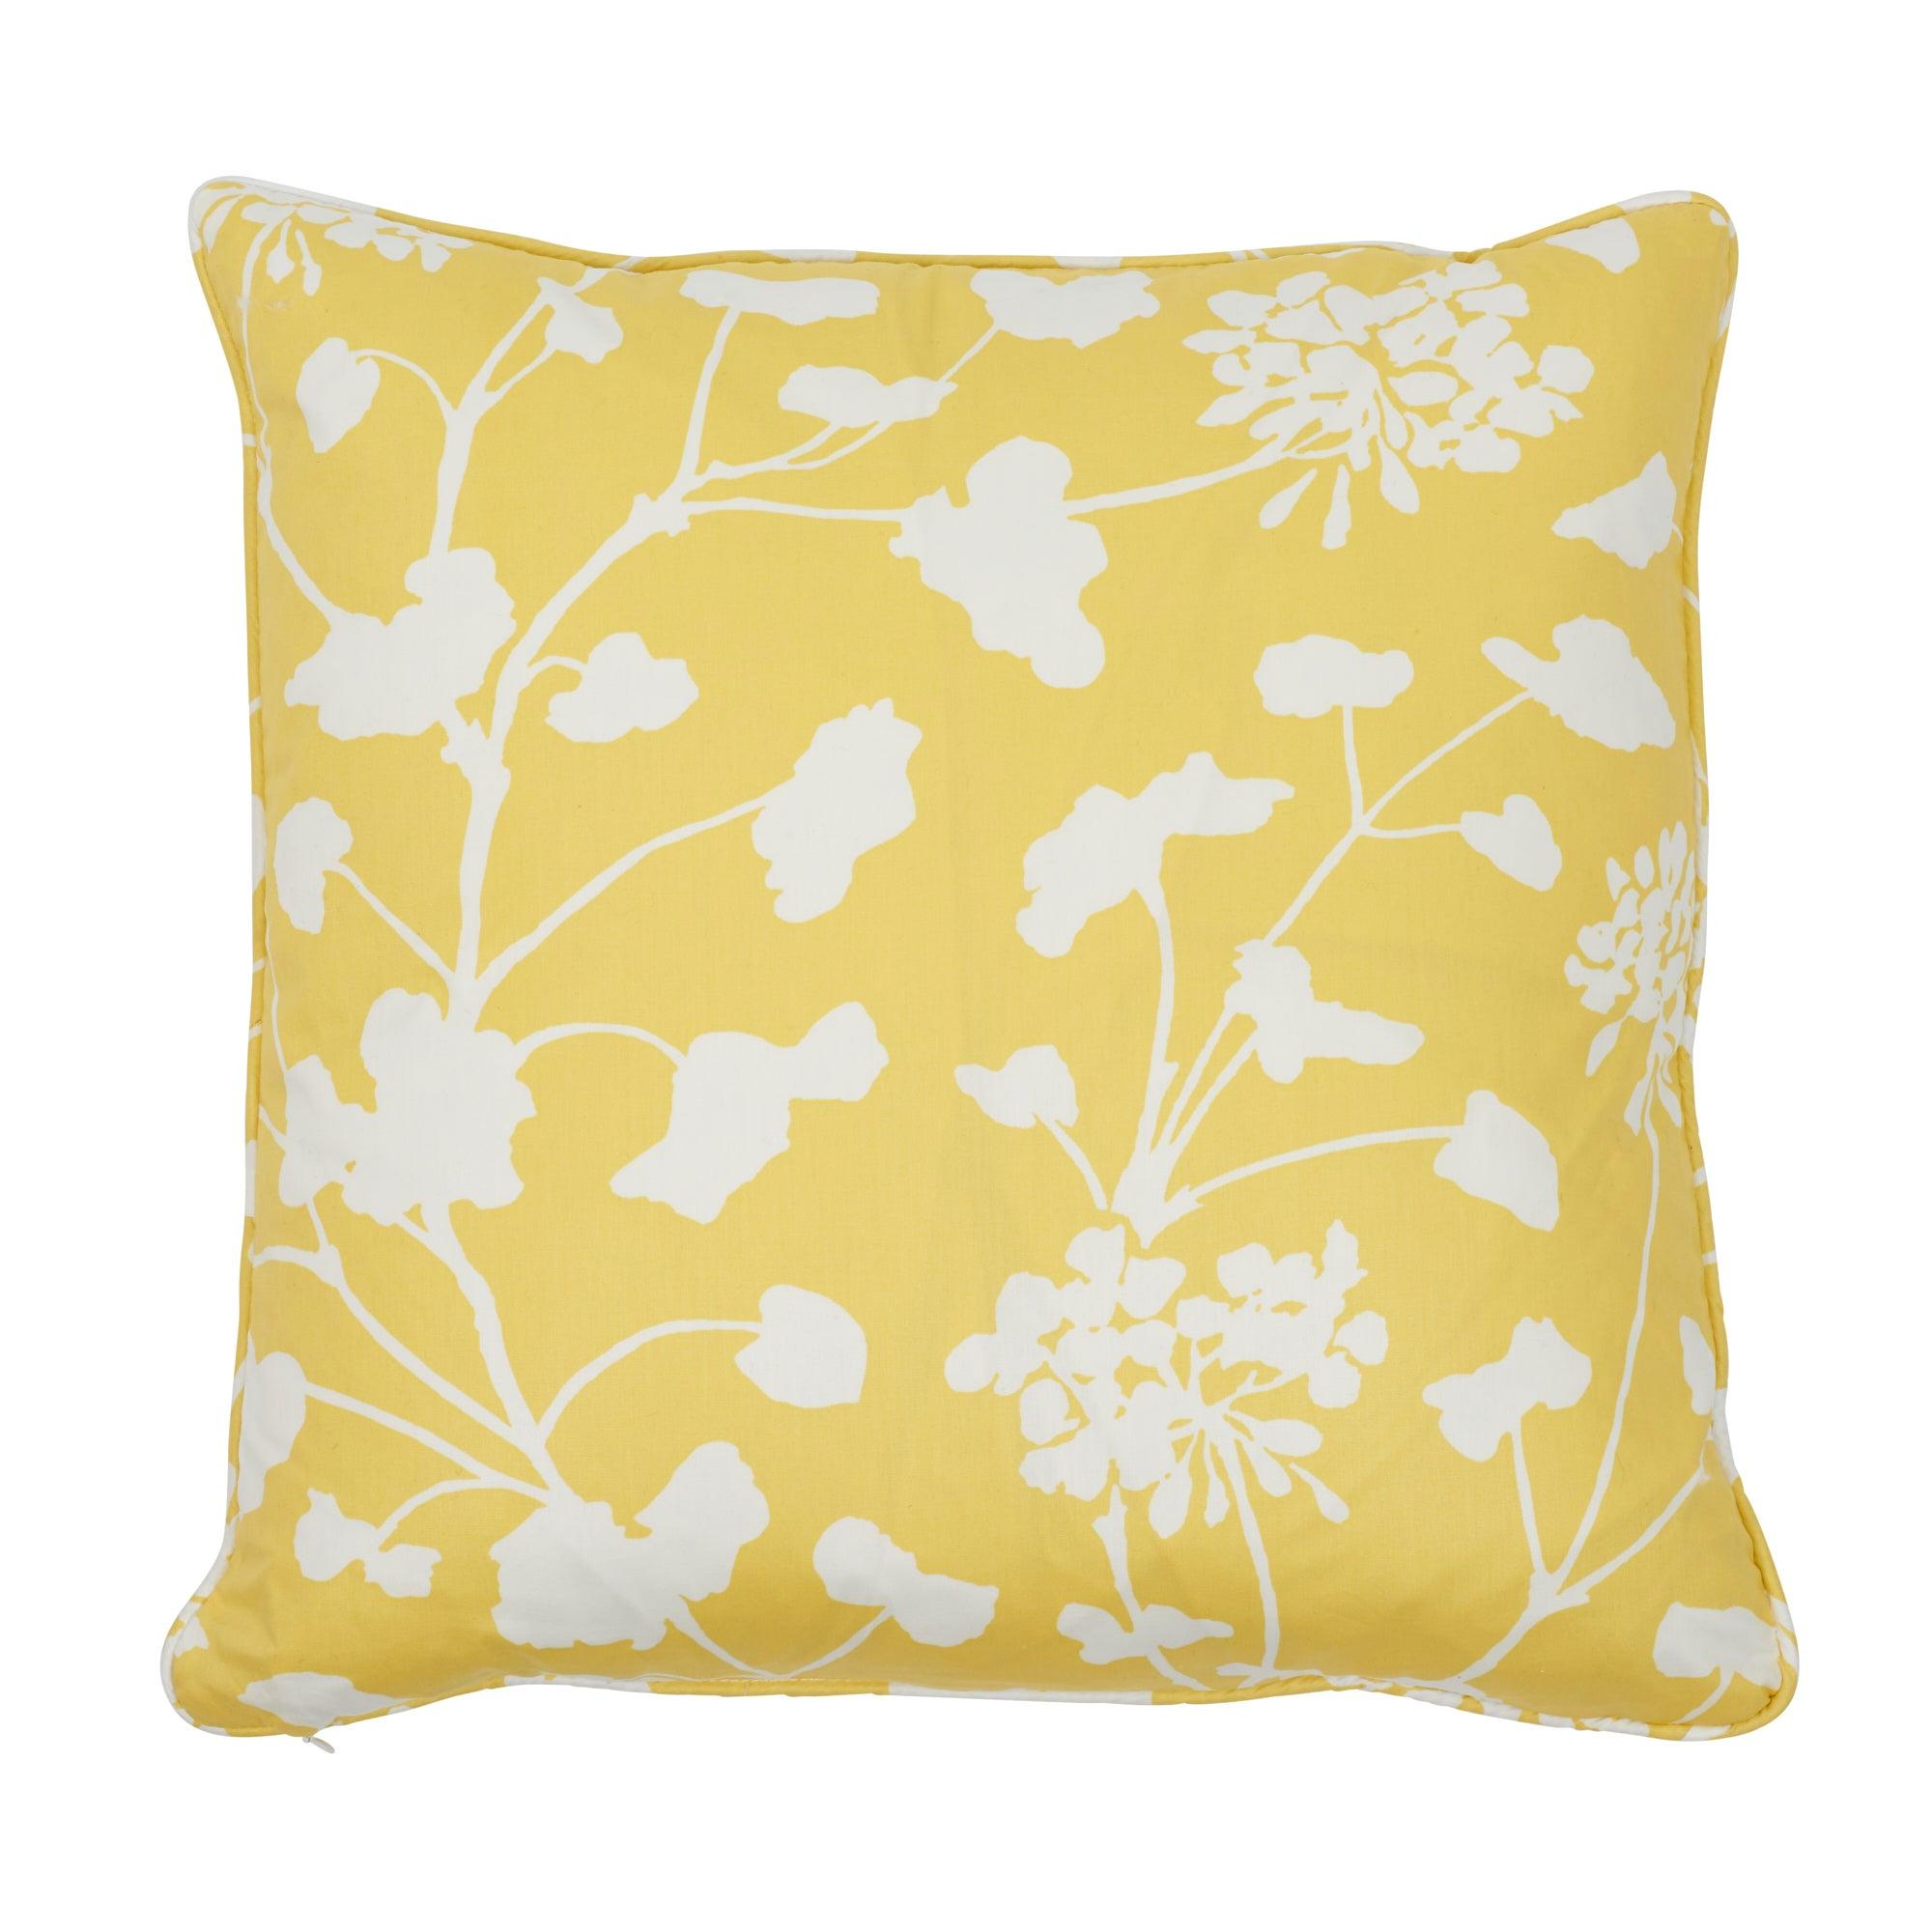 Schumacher Pennick Chintz Yellow Two-Sided Cotton Pillow